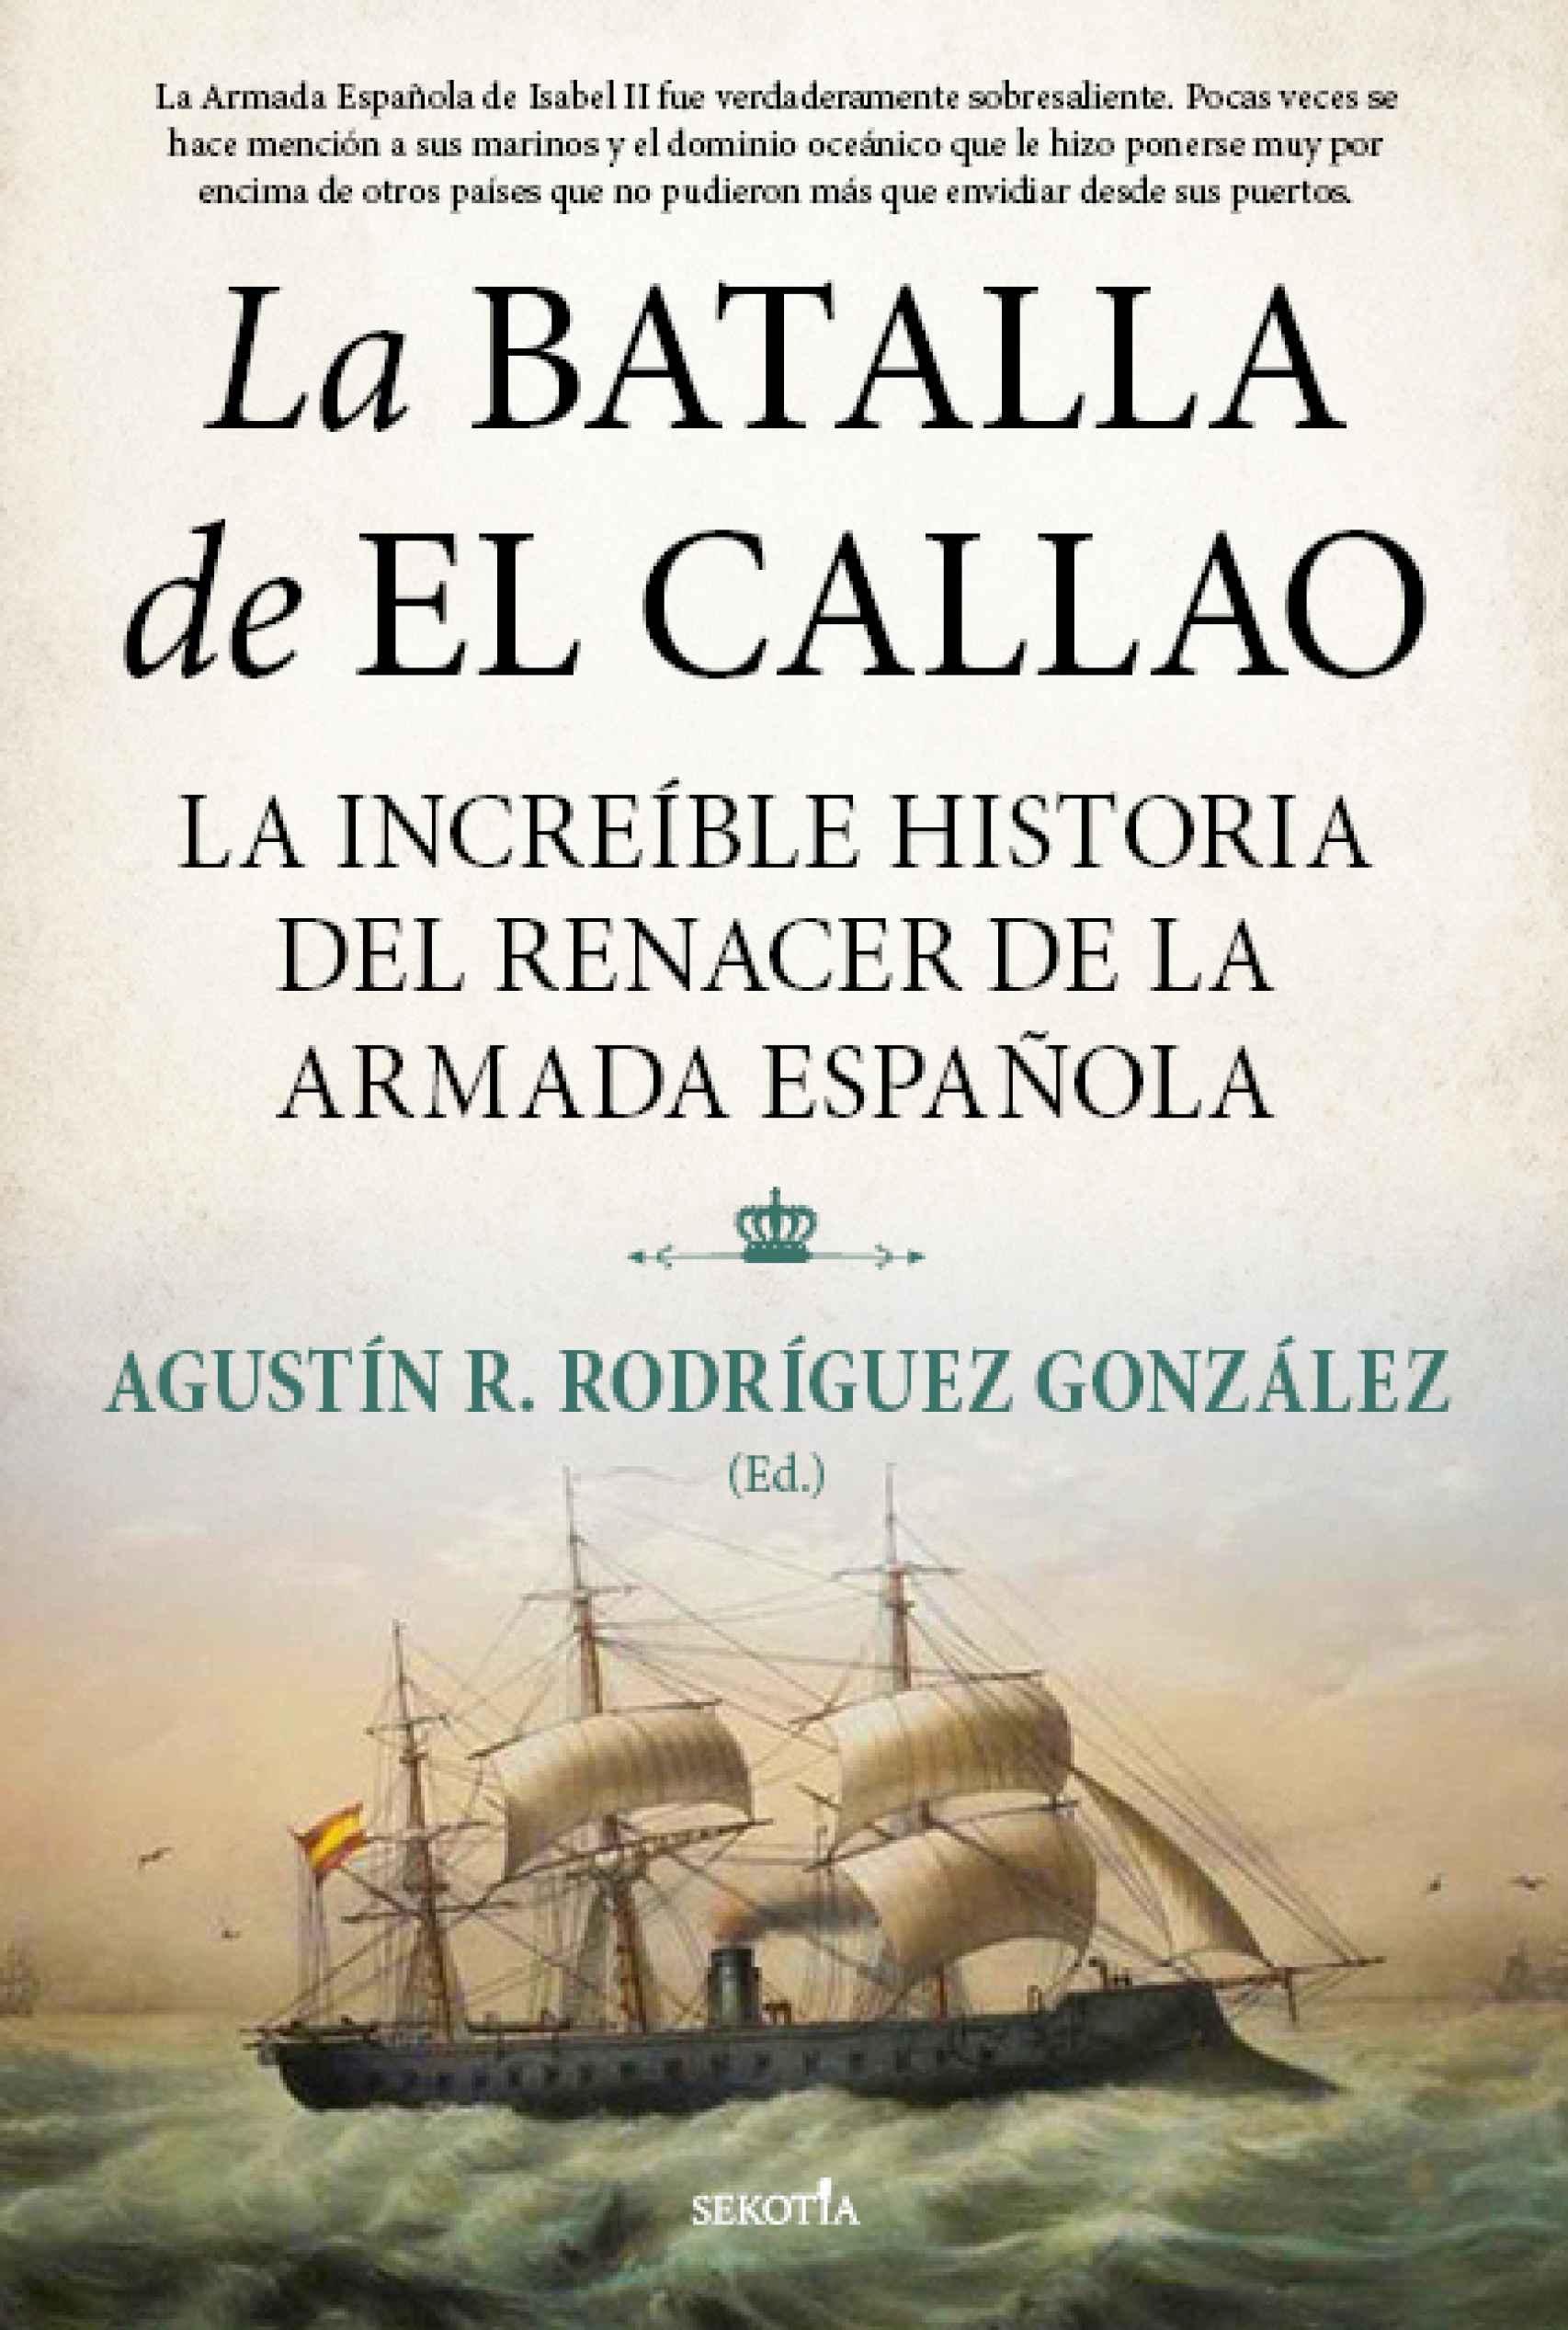 Portada de 'La batalla de El Callao'.